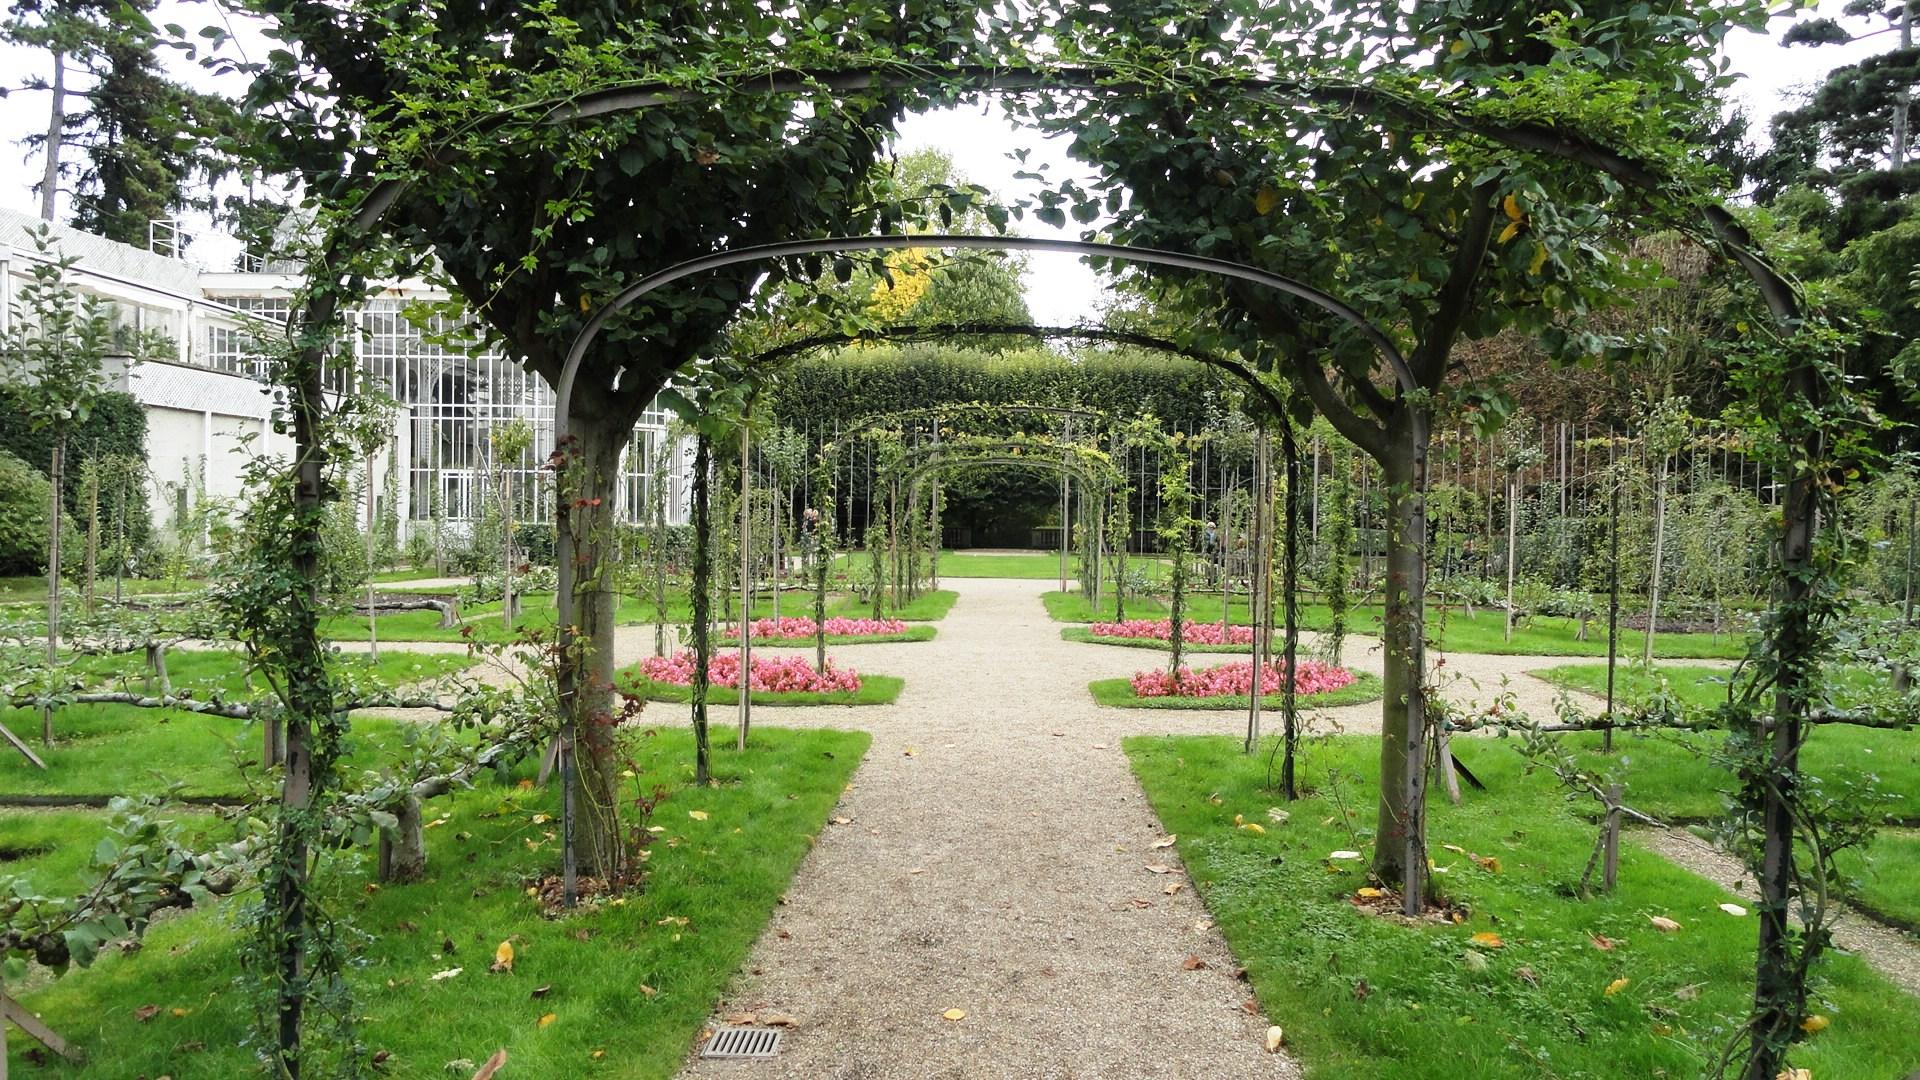 l 39 automne aux jardins albert kahn un petit pois sur dix On jardin anglais albert kahn